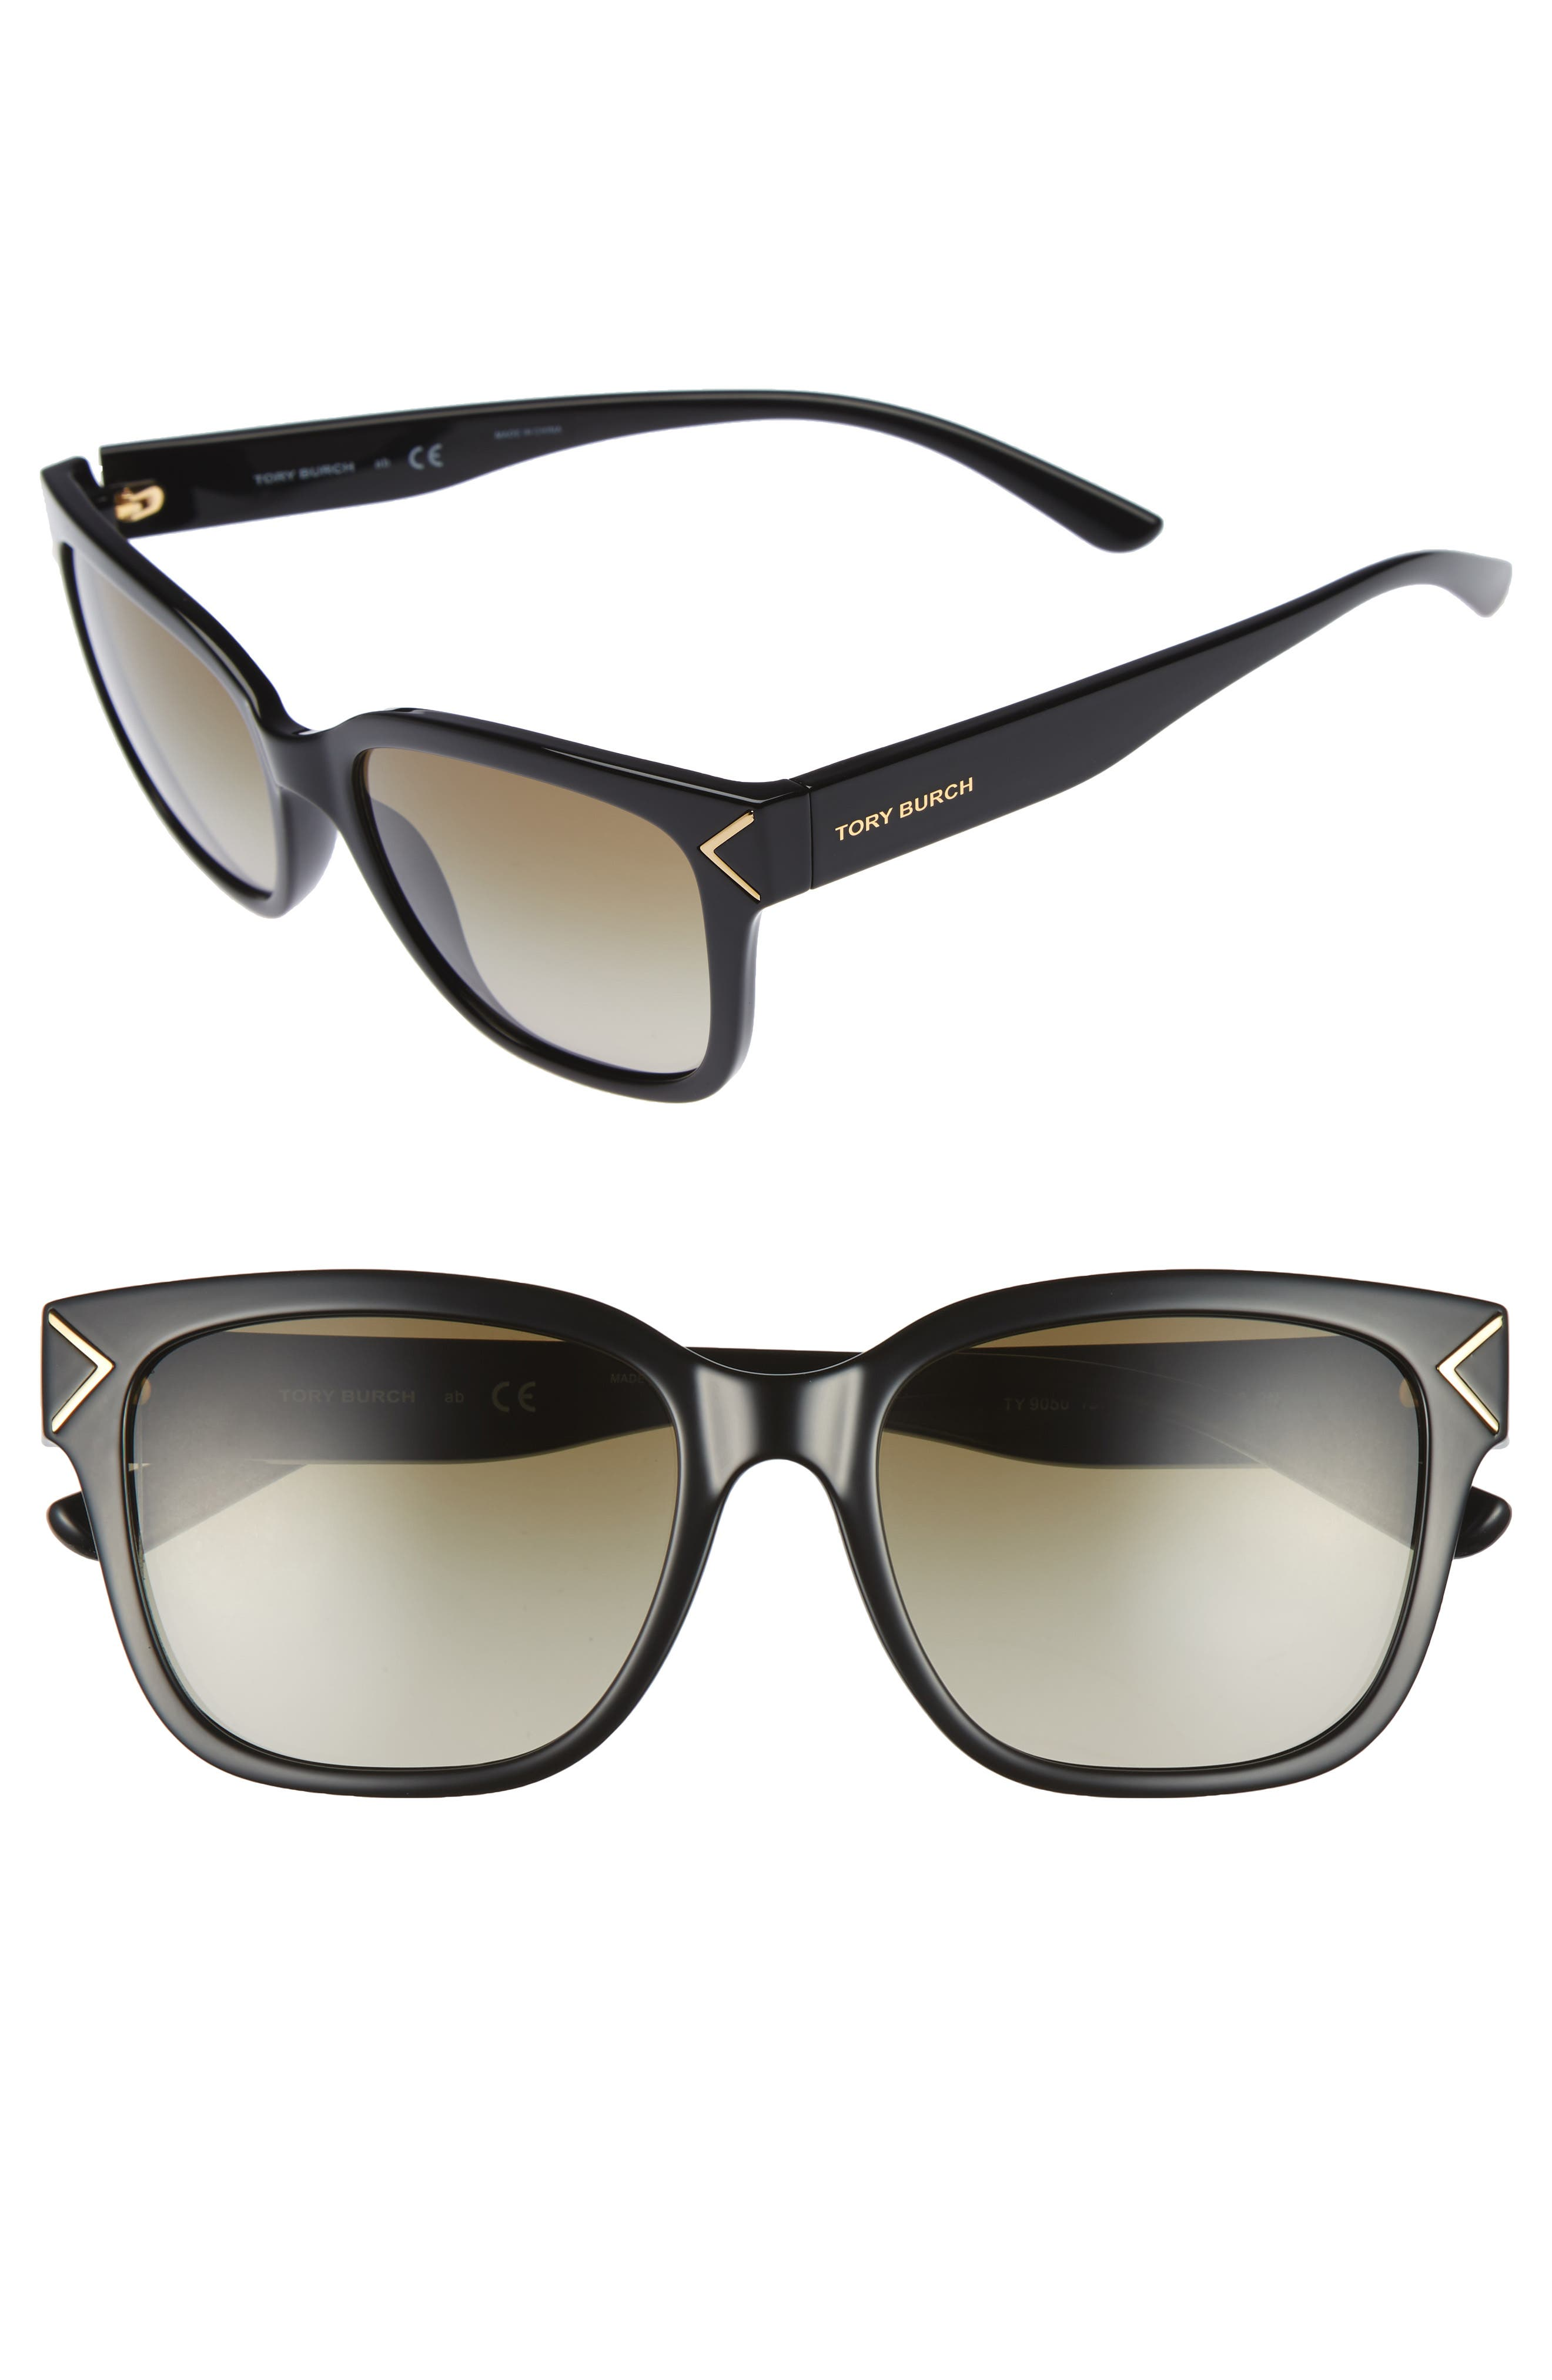 55mm Gradient Sunglasses,                         Main,                         color, 001